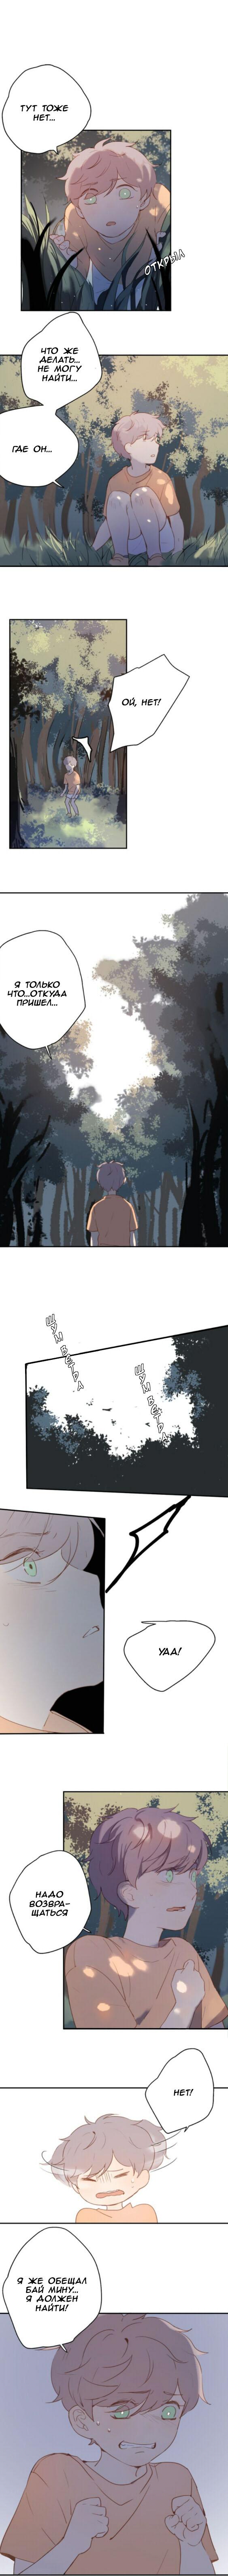 https://r1.ninemanga.com/comics/pic2/52/33012/332158/1503324400292.jpg Page 2